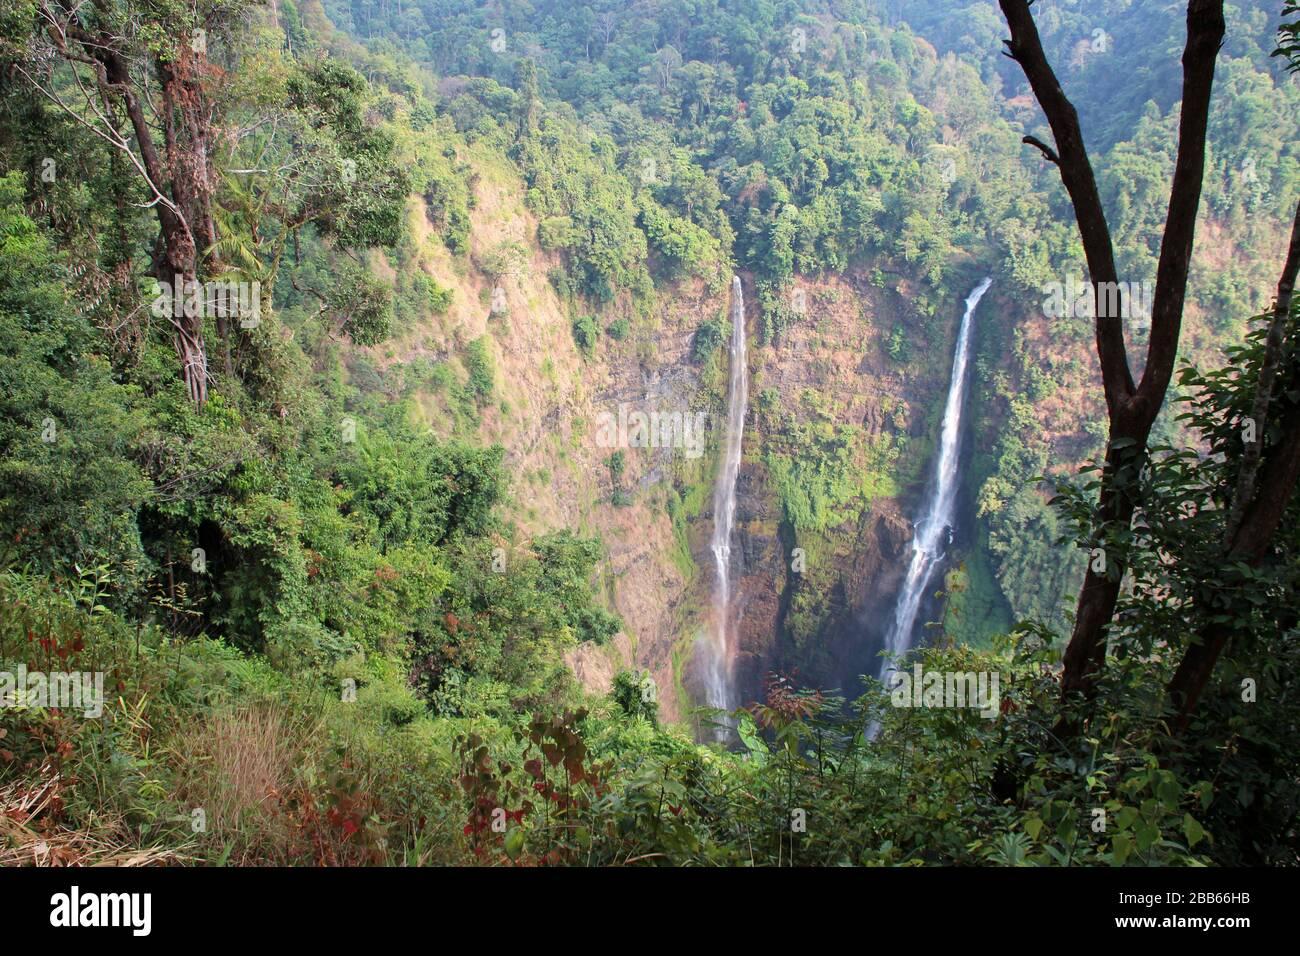 tad fane waterfalls in laos Stock Photo